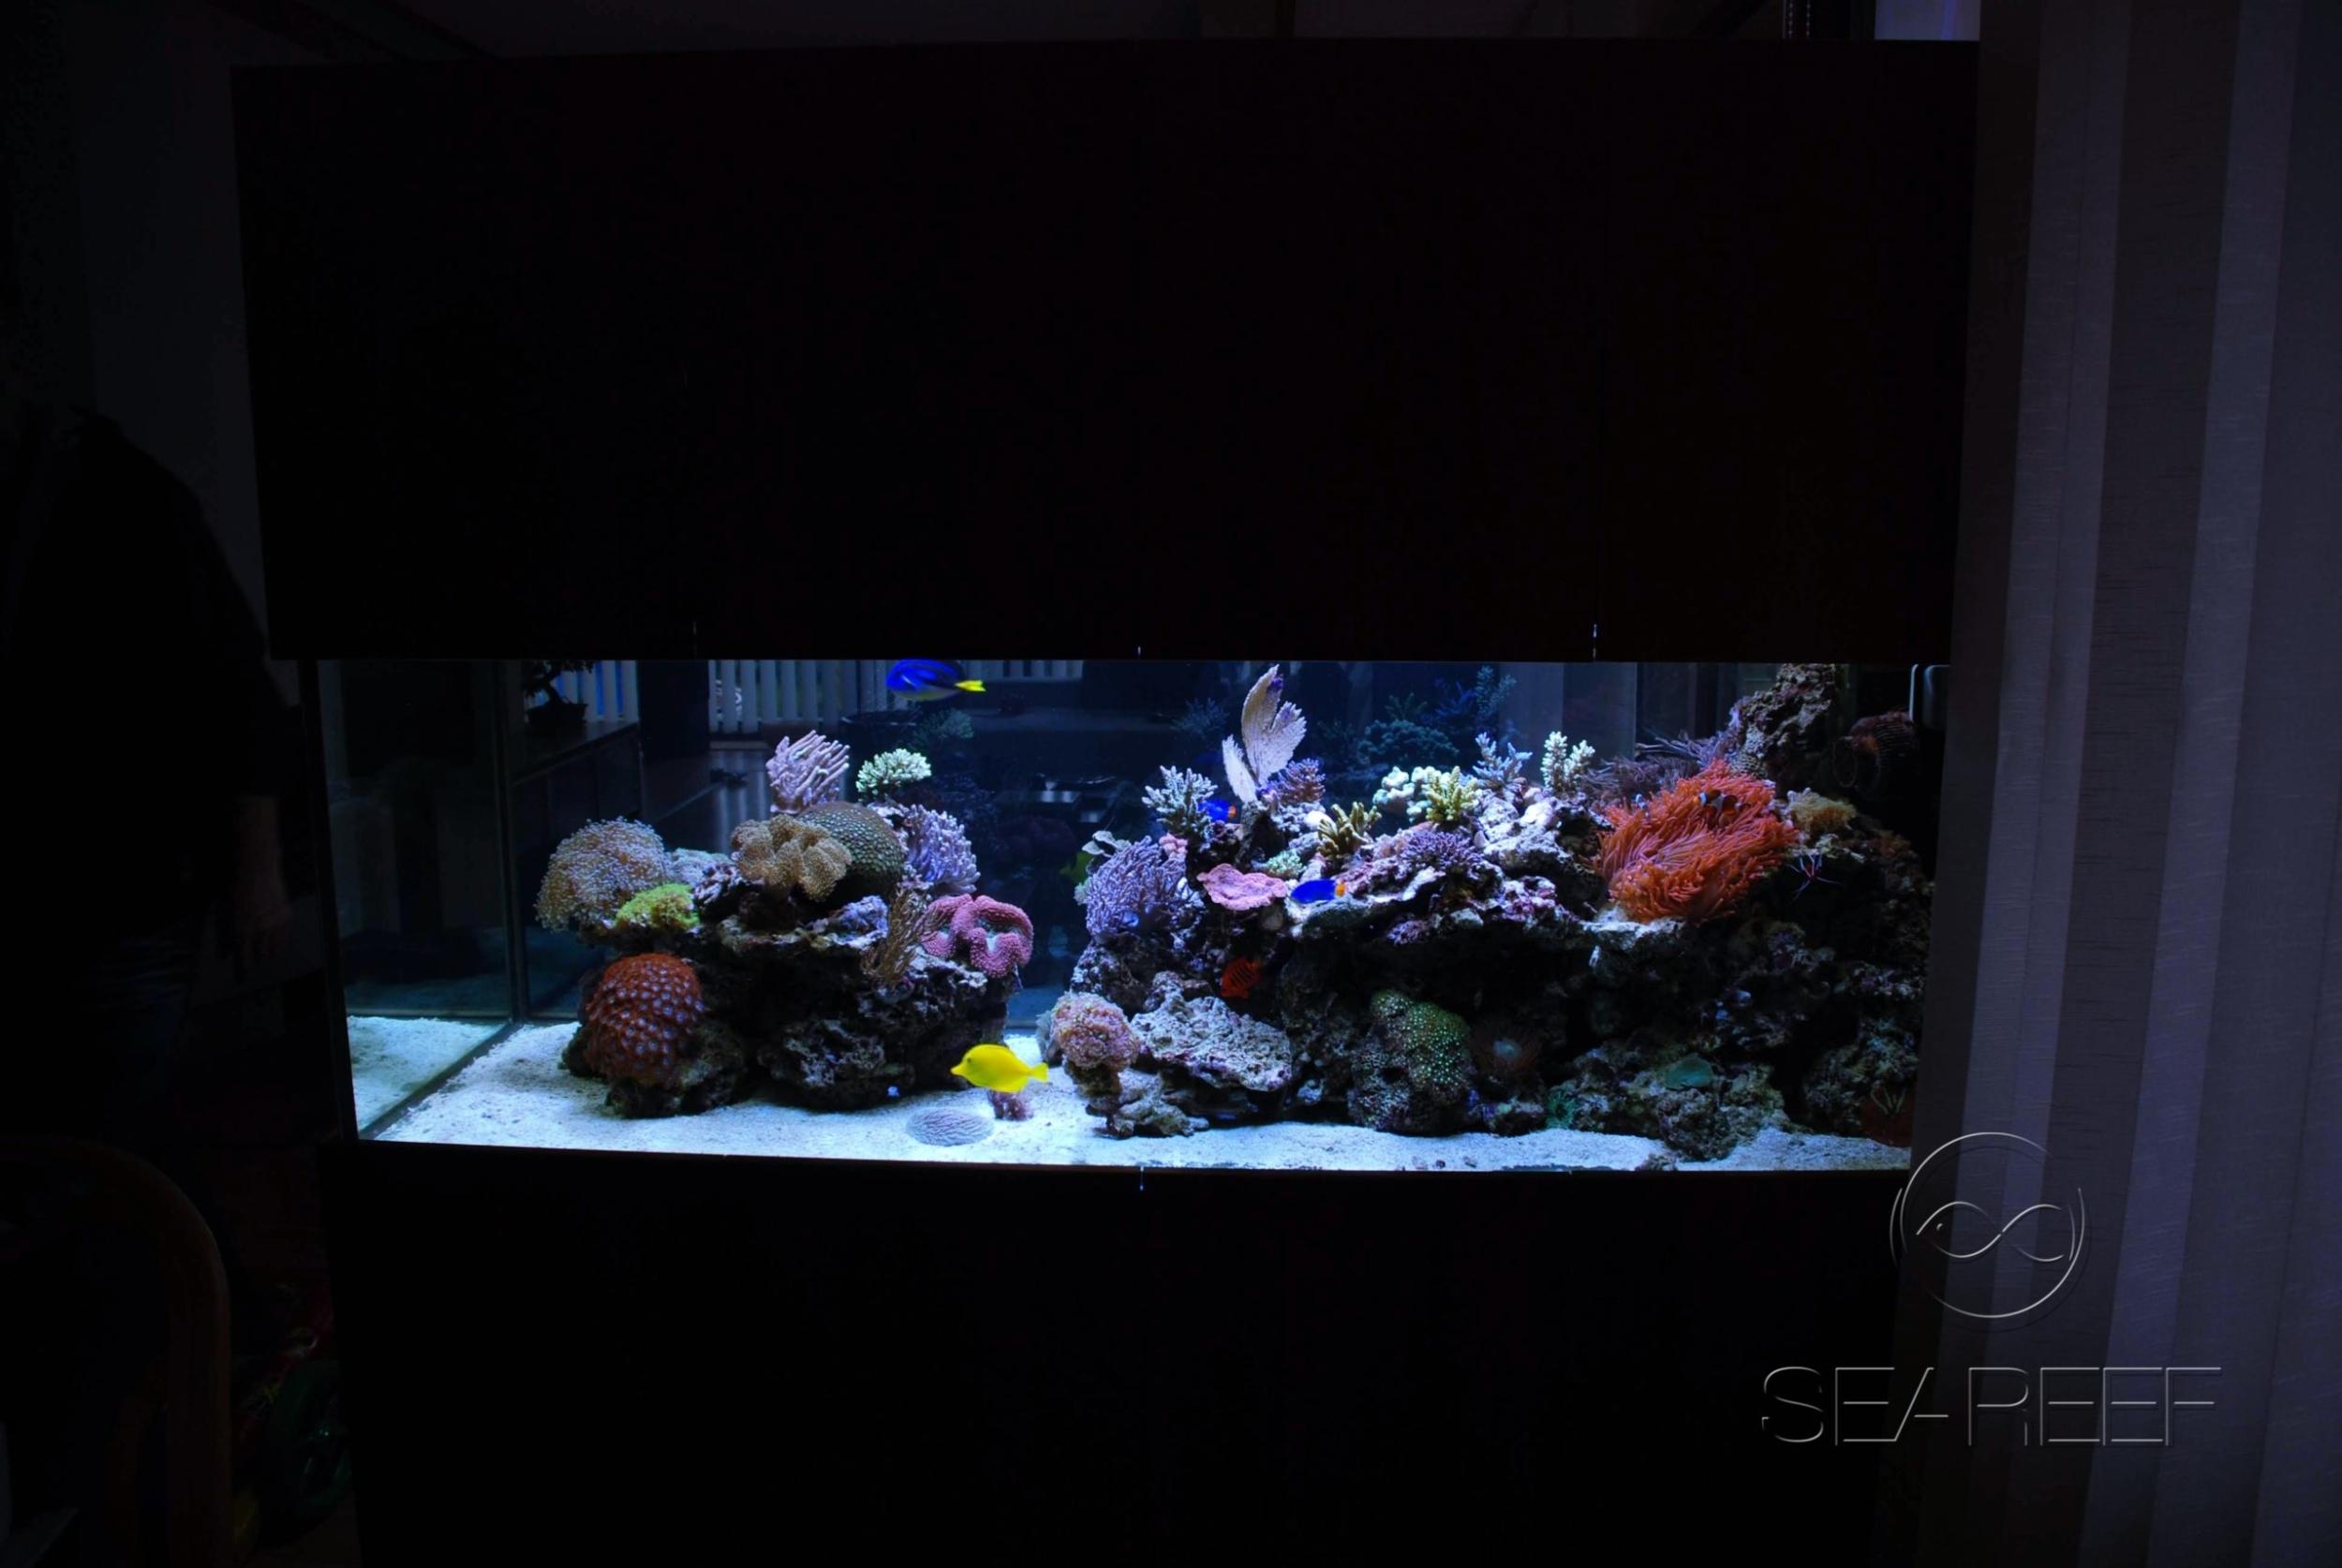 Mořské 700l akvárium na míru s korály a rybami.